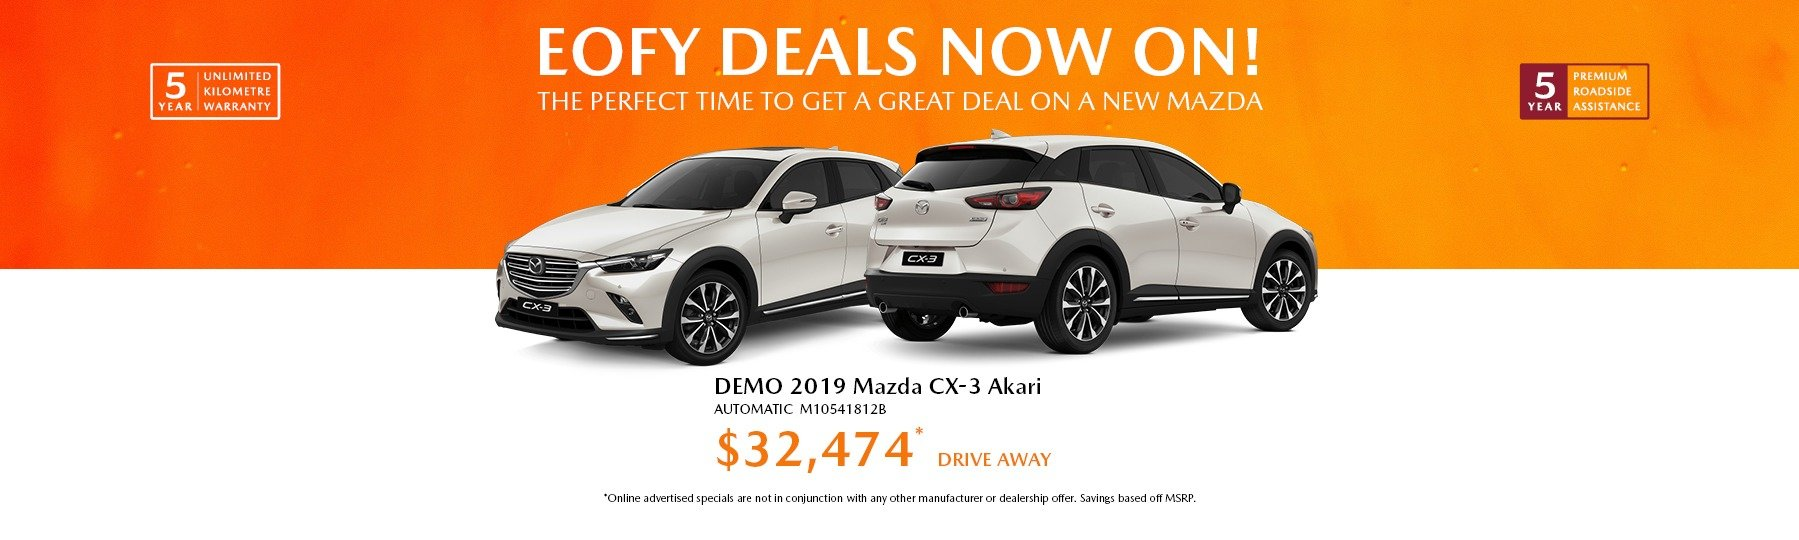 Newcastle Mazda EOFY DEMO DEALS